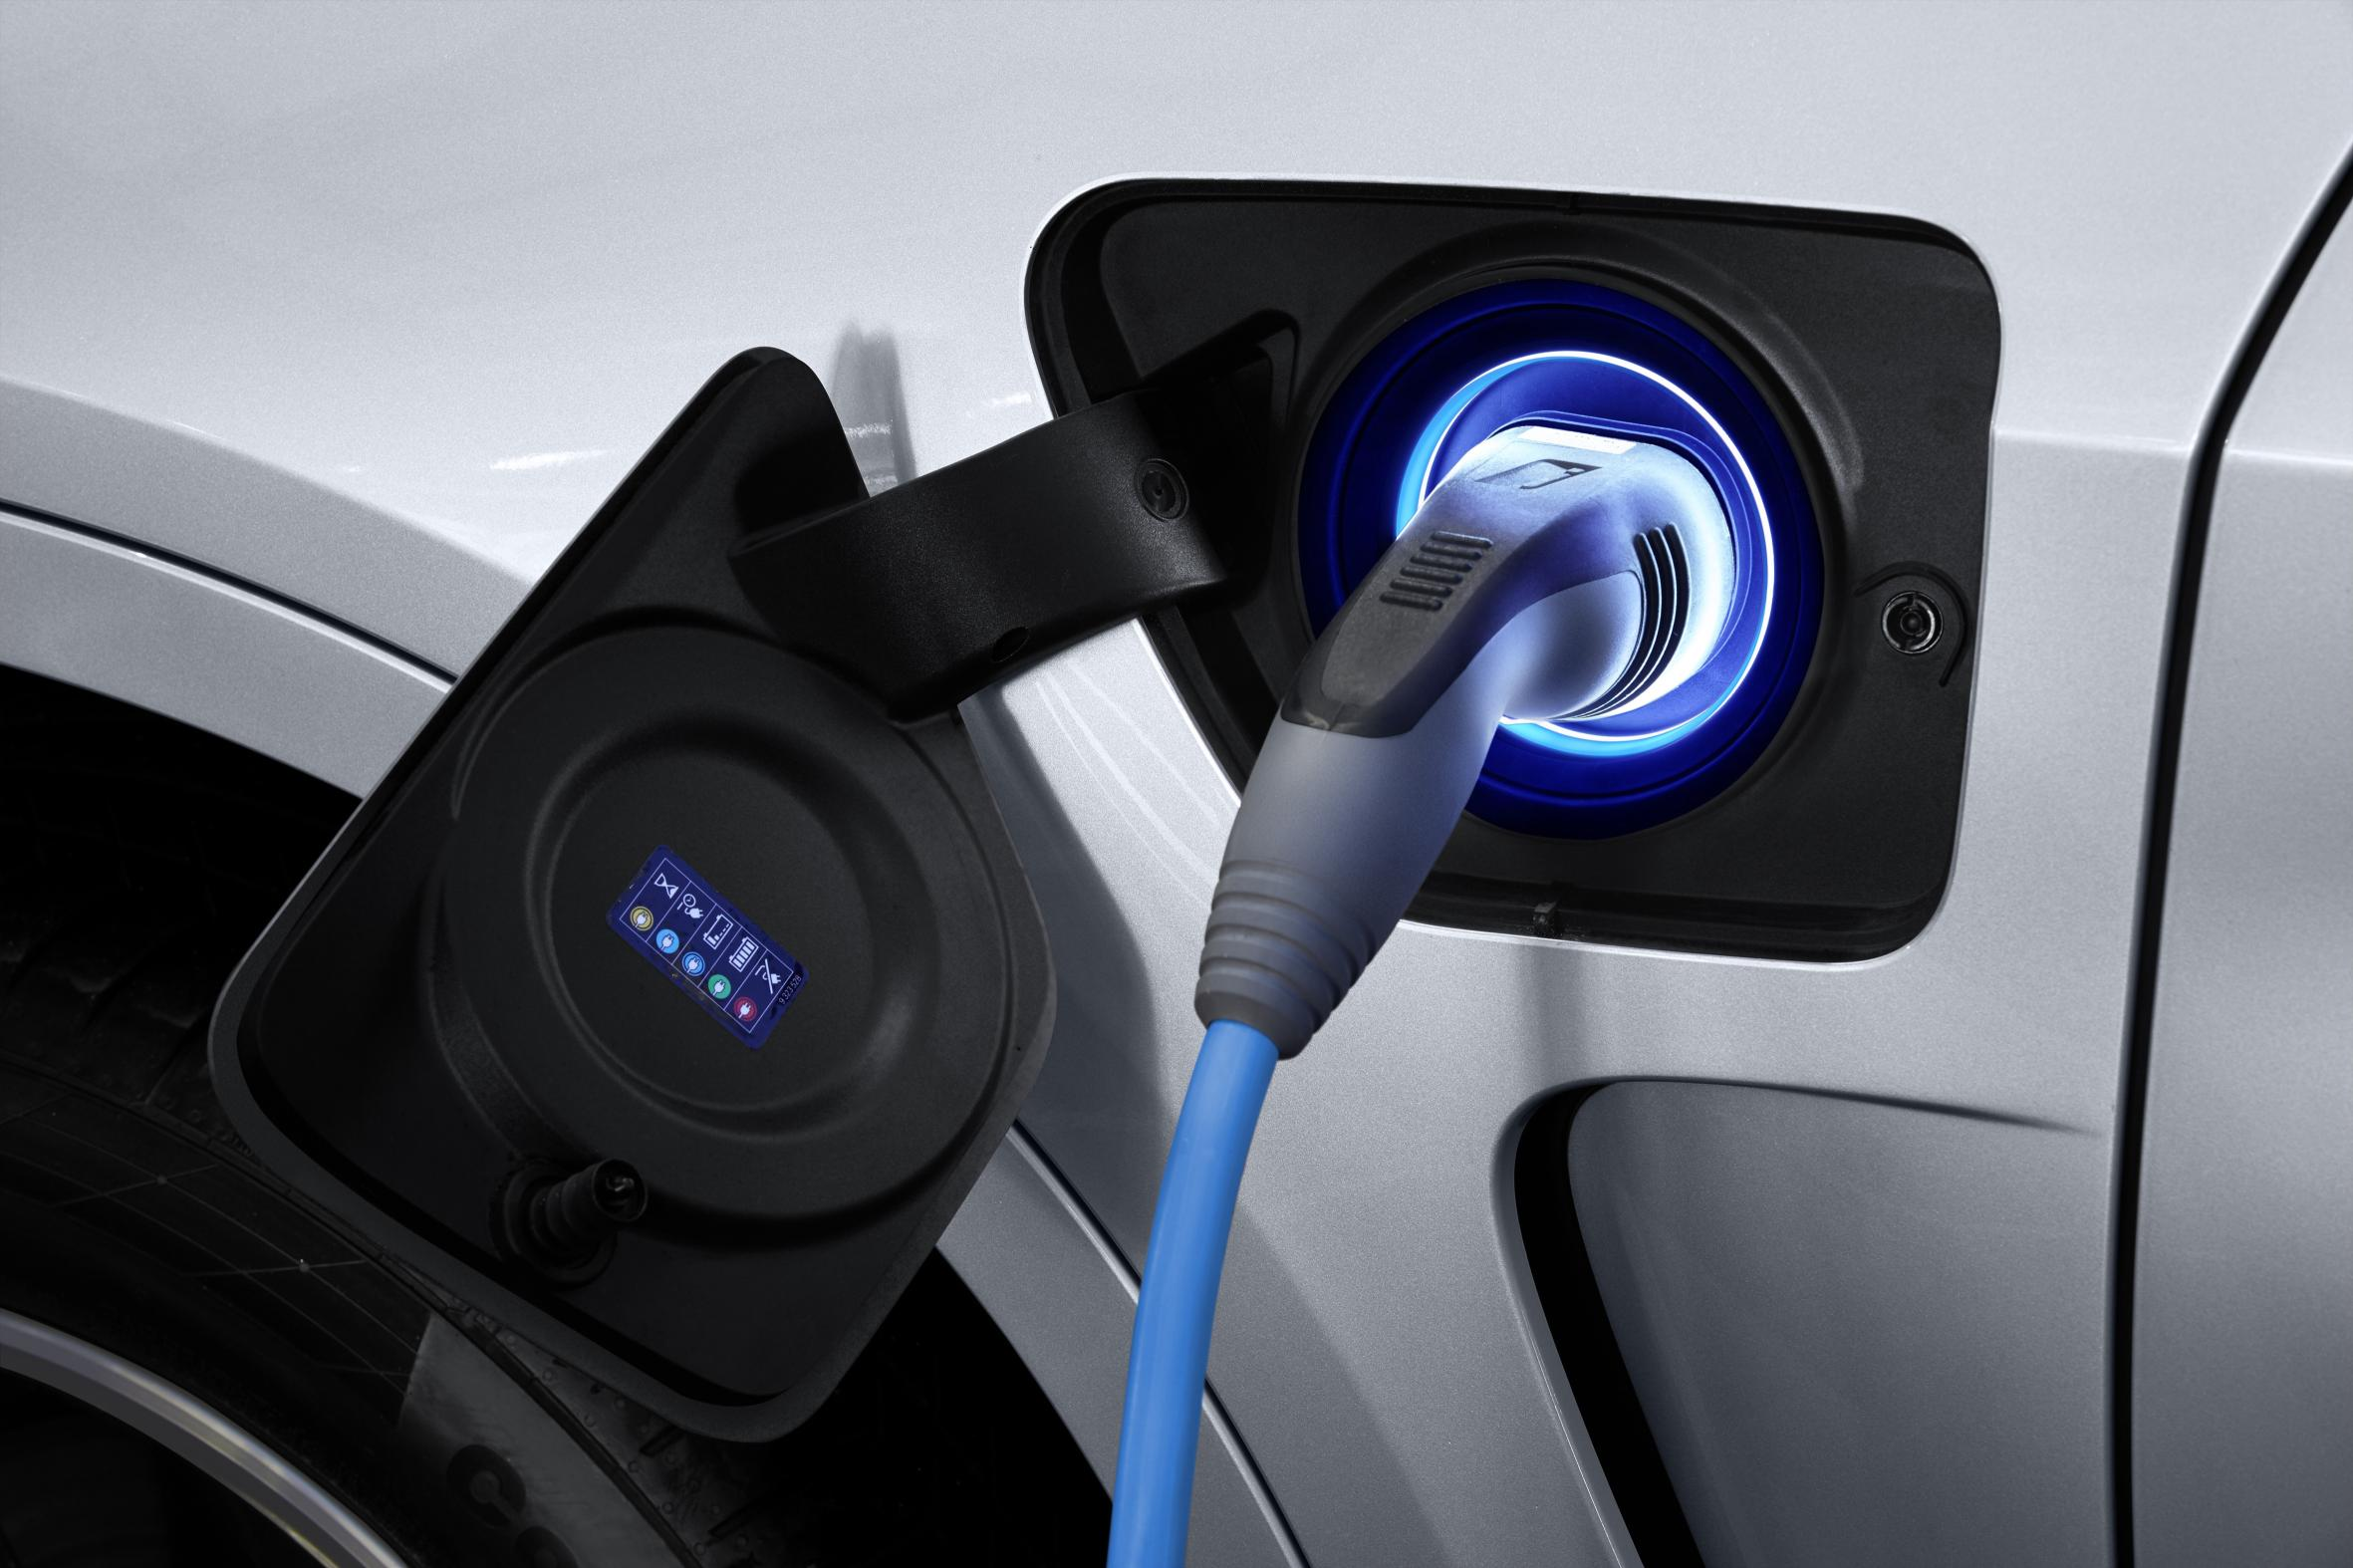 BMW X5 xDrive40e: Llega el SUV híbrido enchufable con tecnología eDrive 1